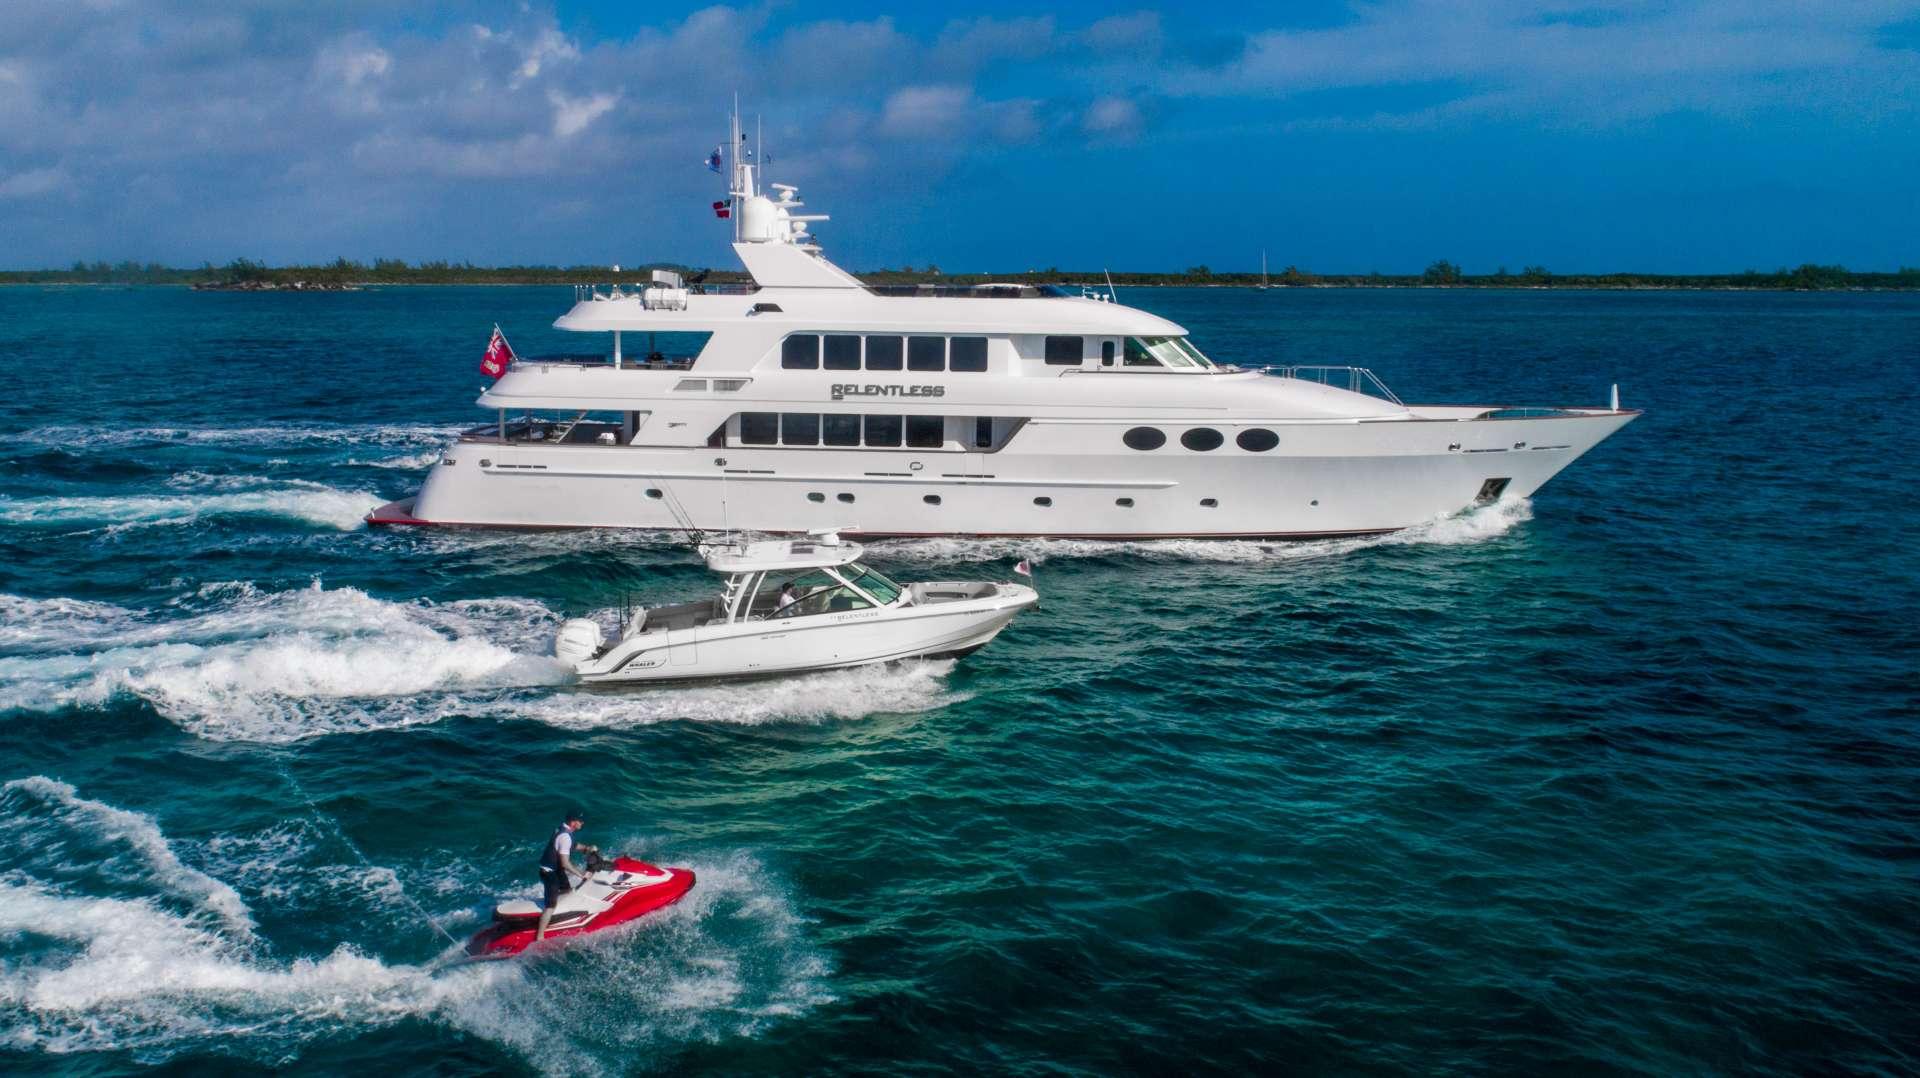 Image of RELENTLESS yacht #18